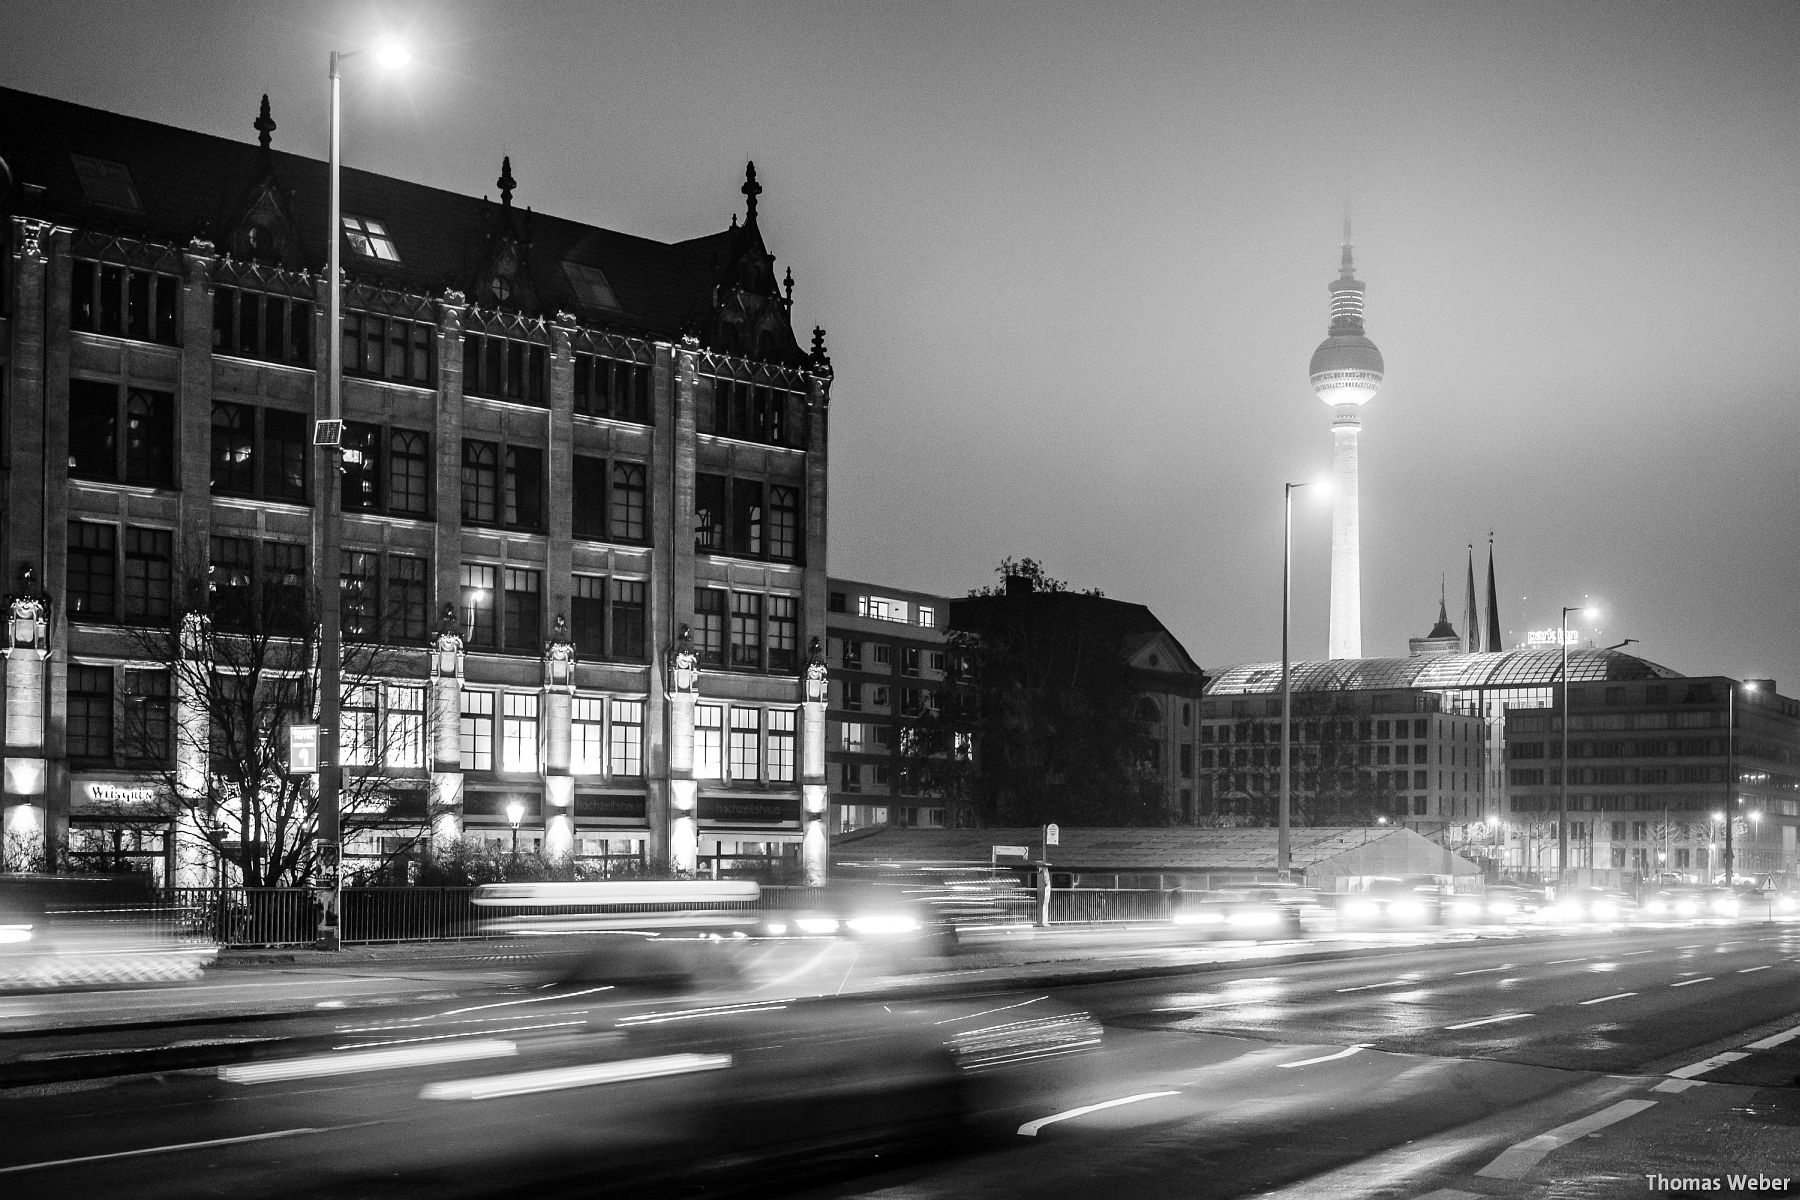 nachtfotos in berlin fotograf filmer thomas weber aus oldenburg. Black Bedroom Furniture Sets. Home Design Ideas